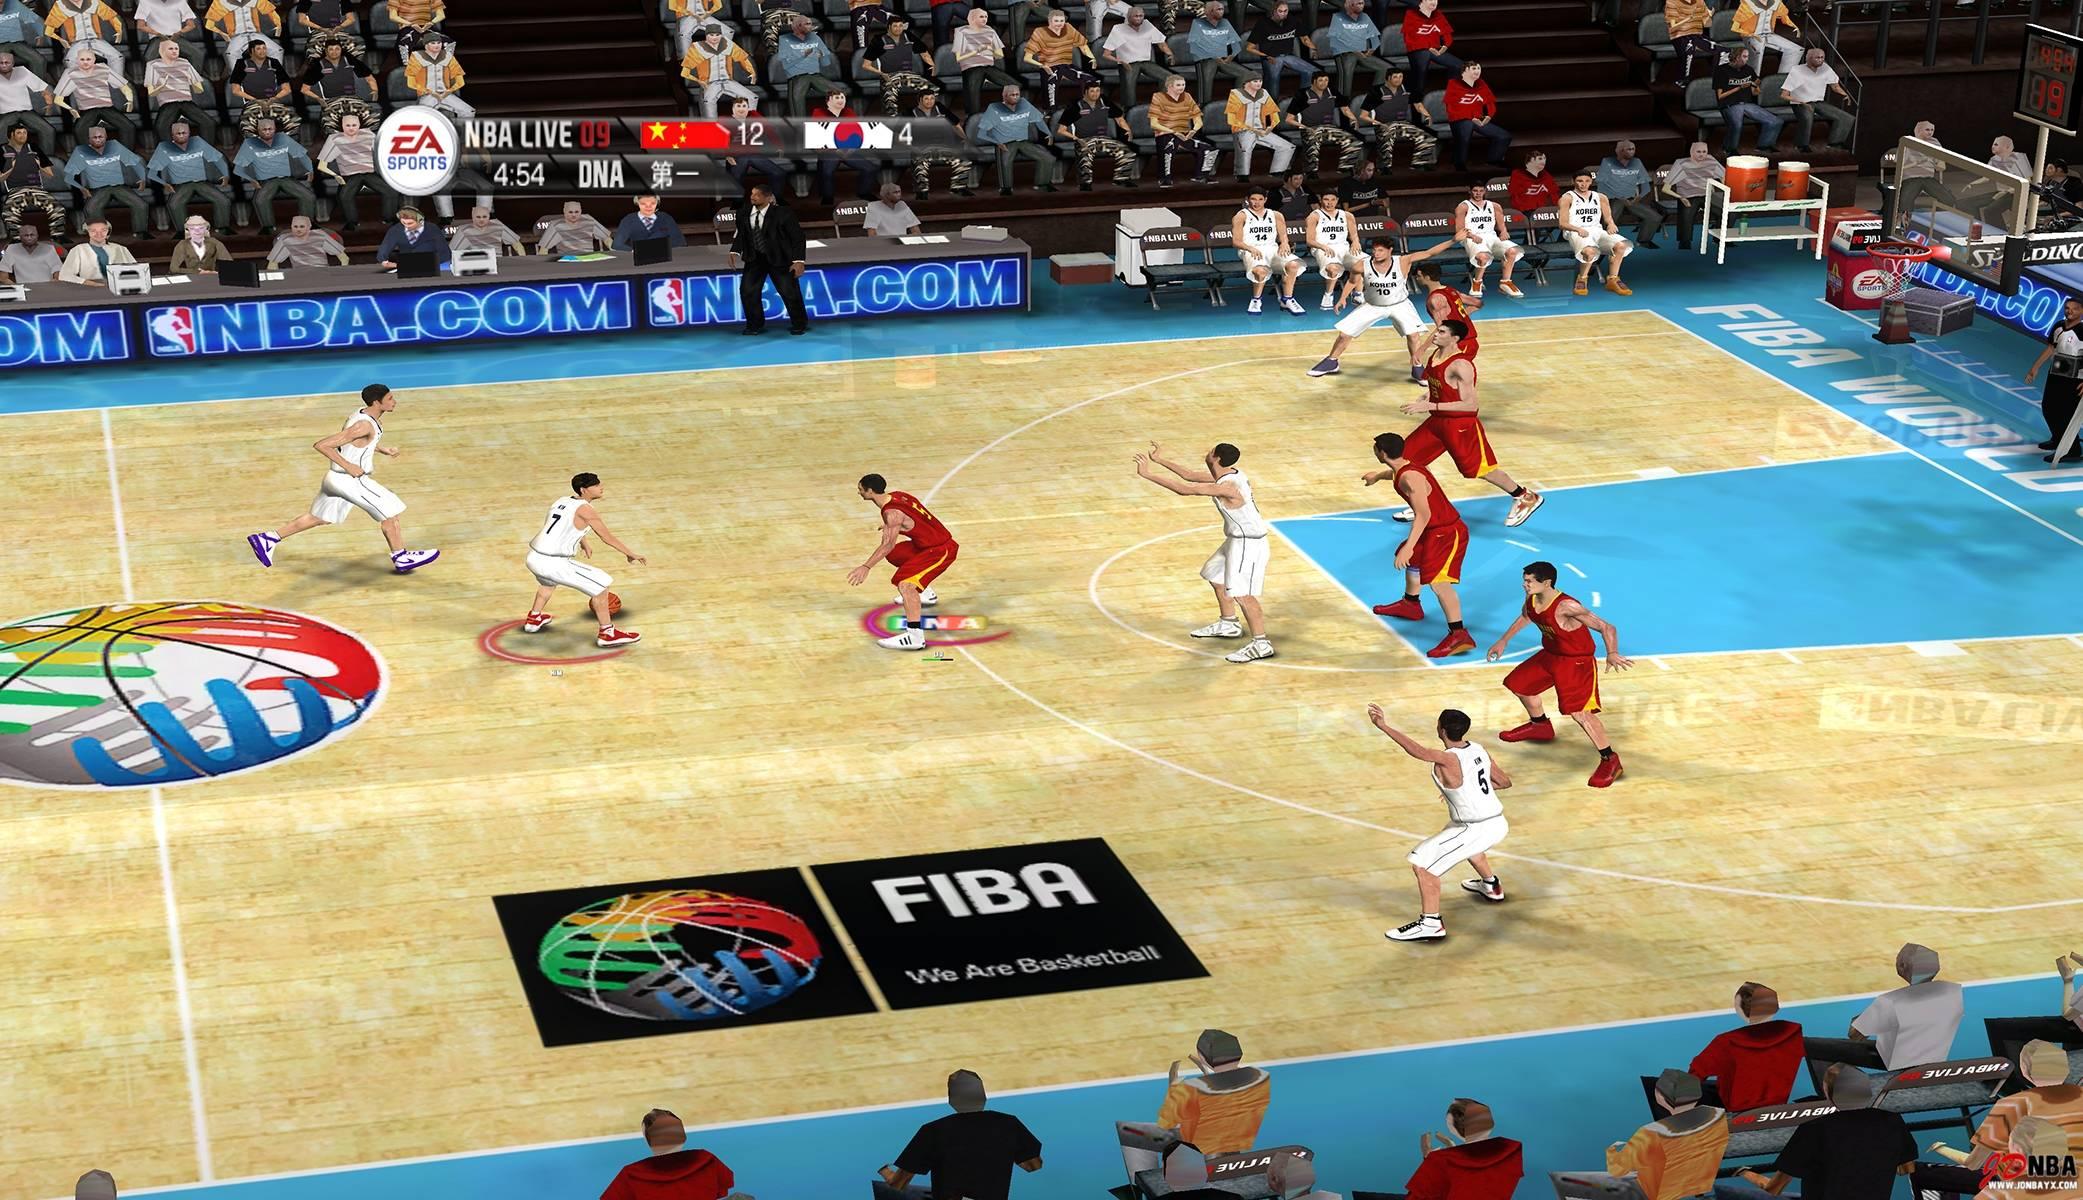 NBA LIVE 09【4K】-2021-08-28-01-30-18-317副本.jpg